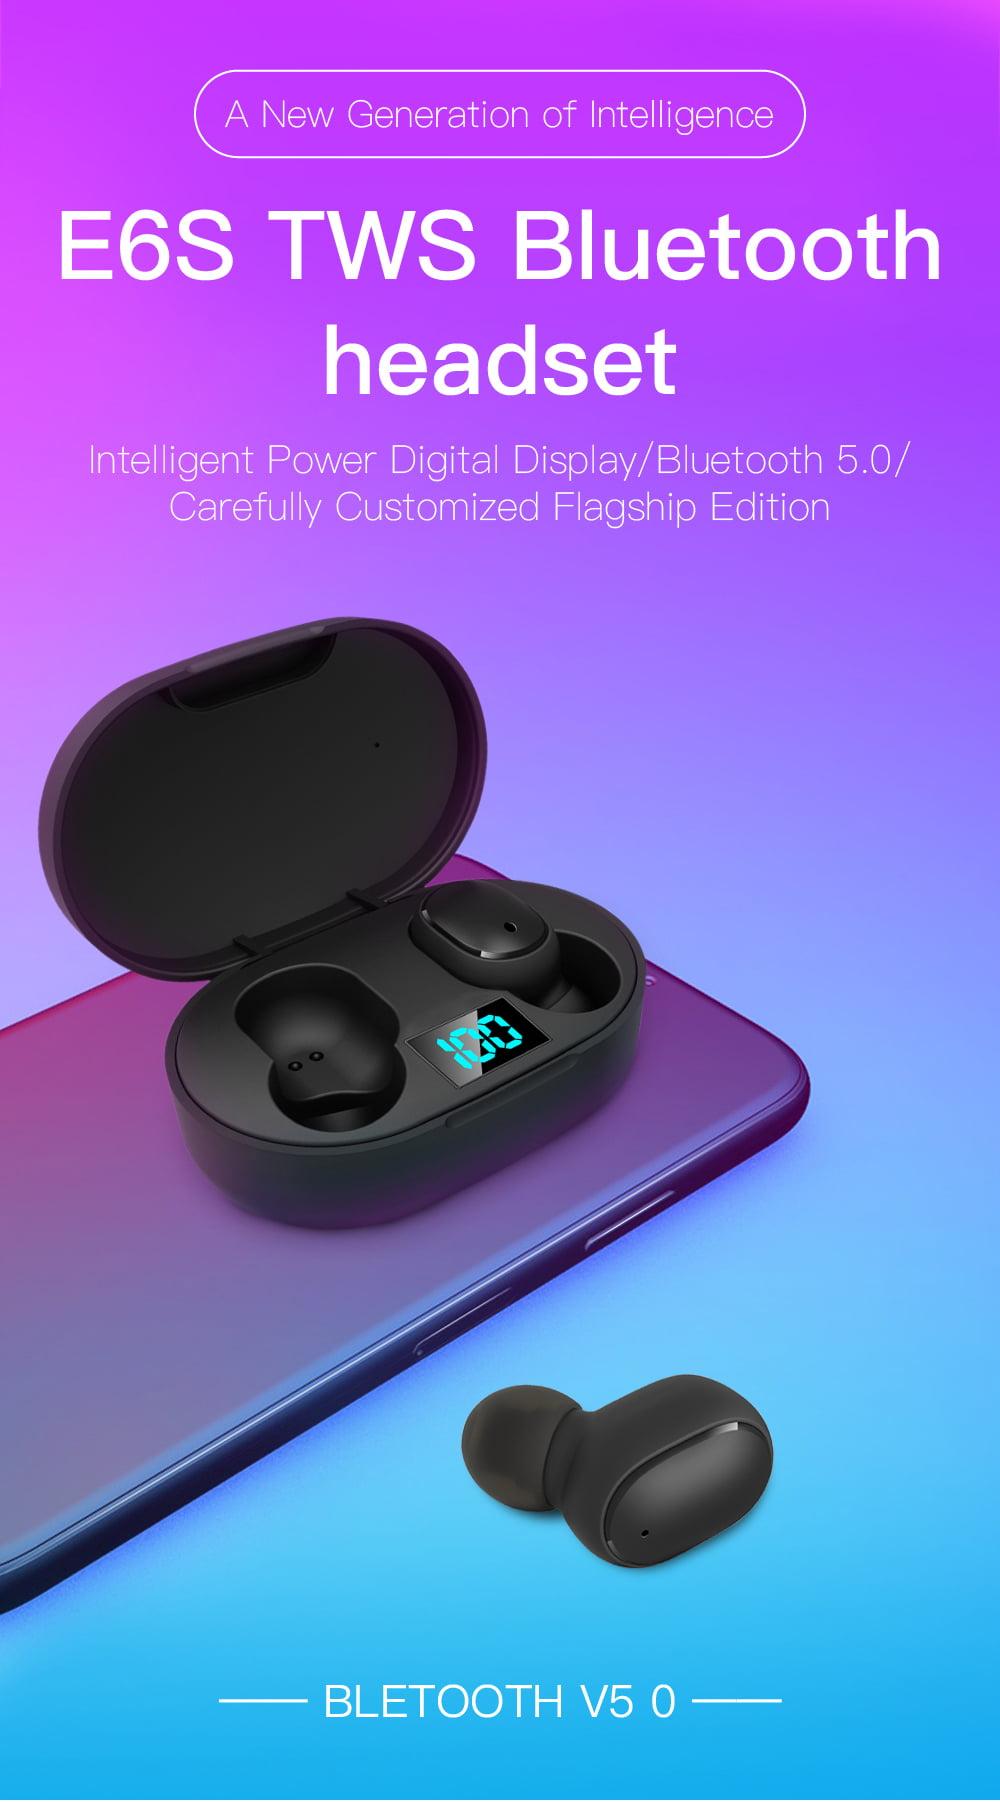 E6s tws bluetooth 5.0 earbuds digital display earphone (6)